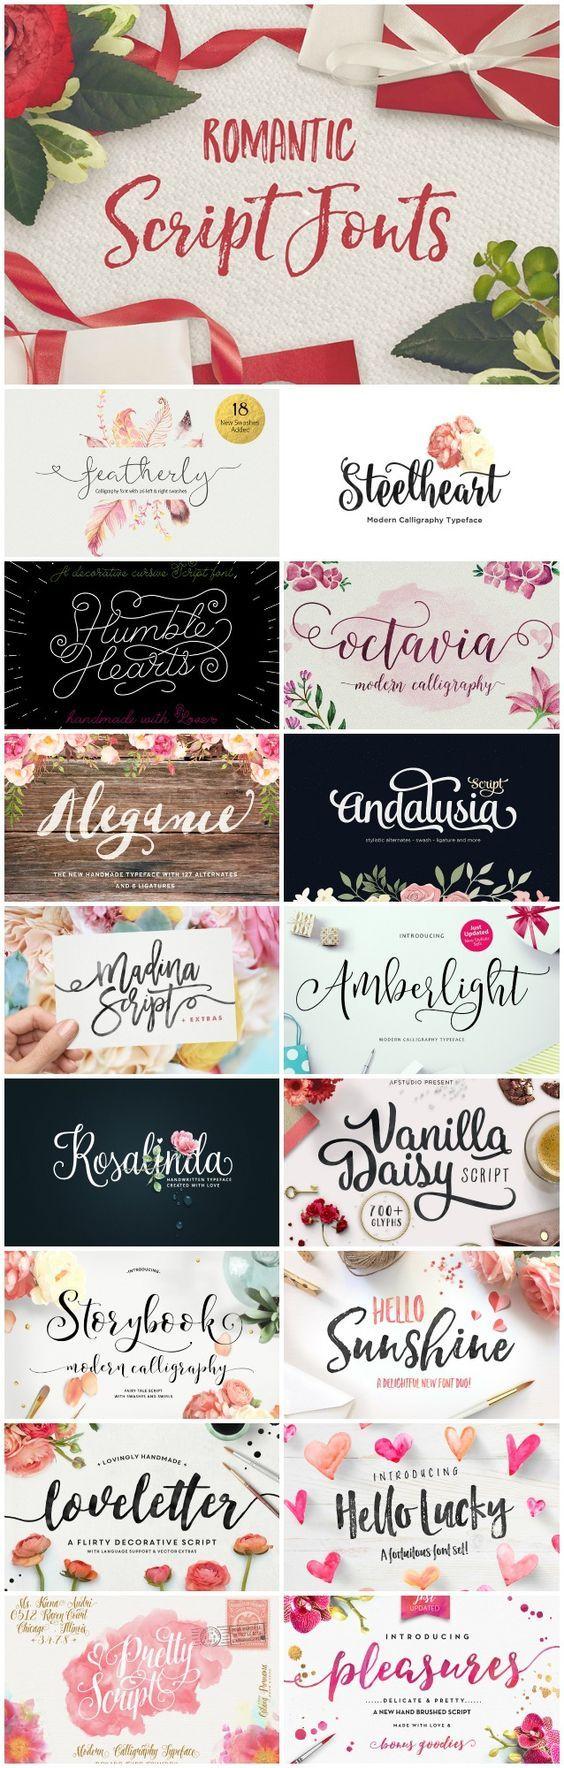 30 Romantic Script Fonts Free Pretty